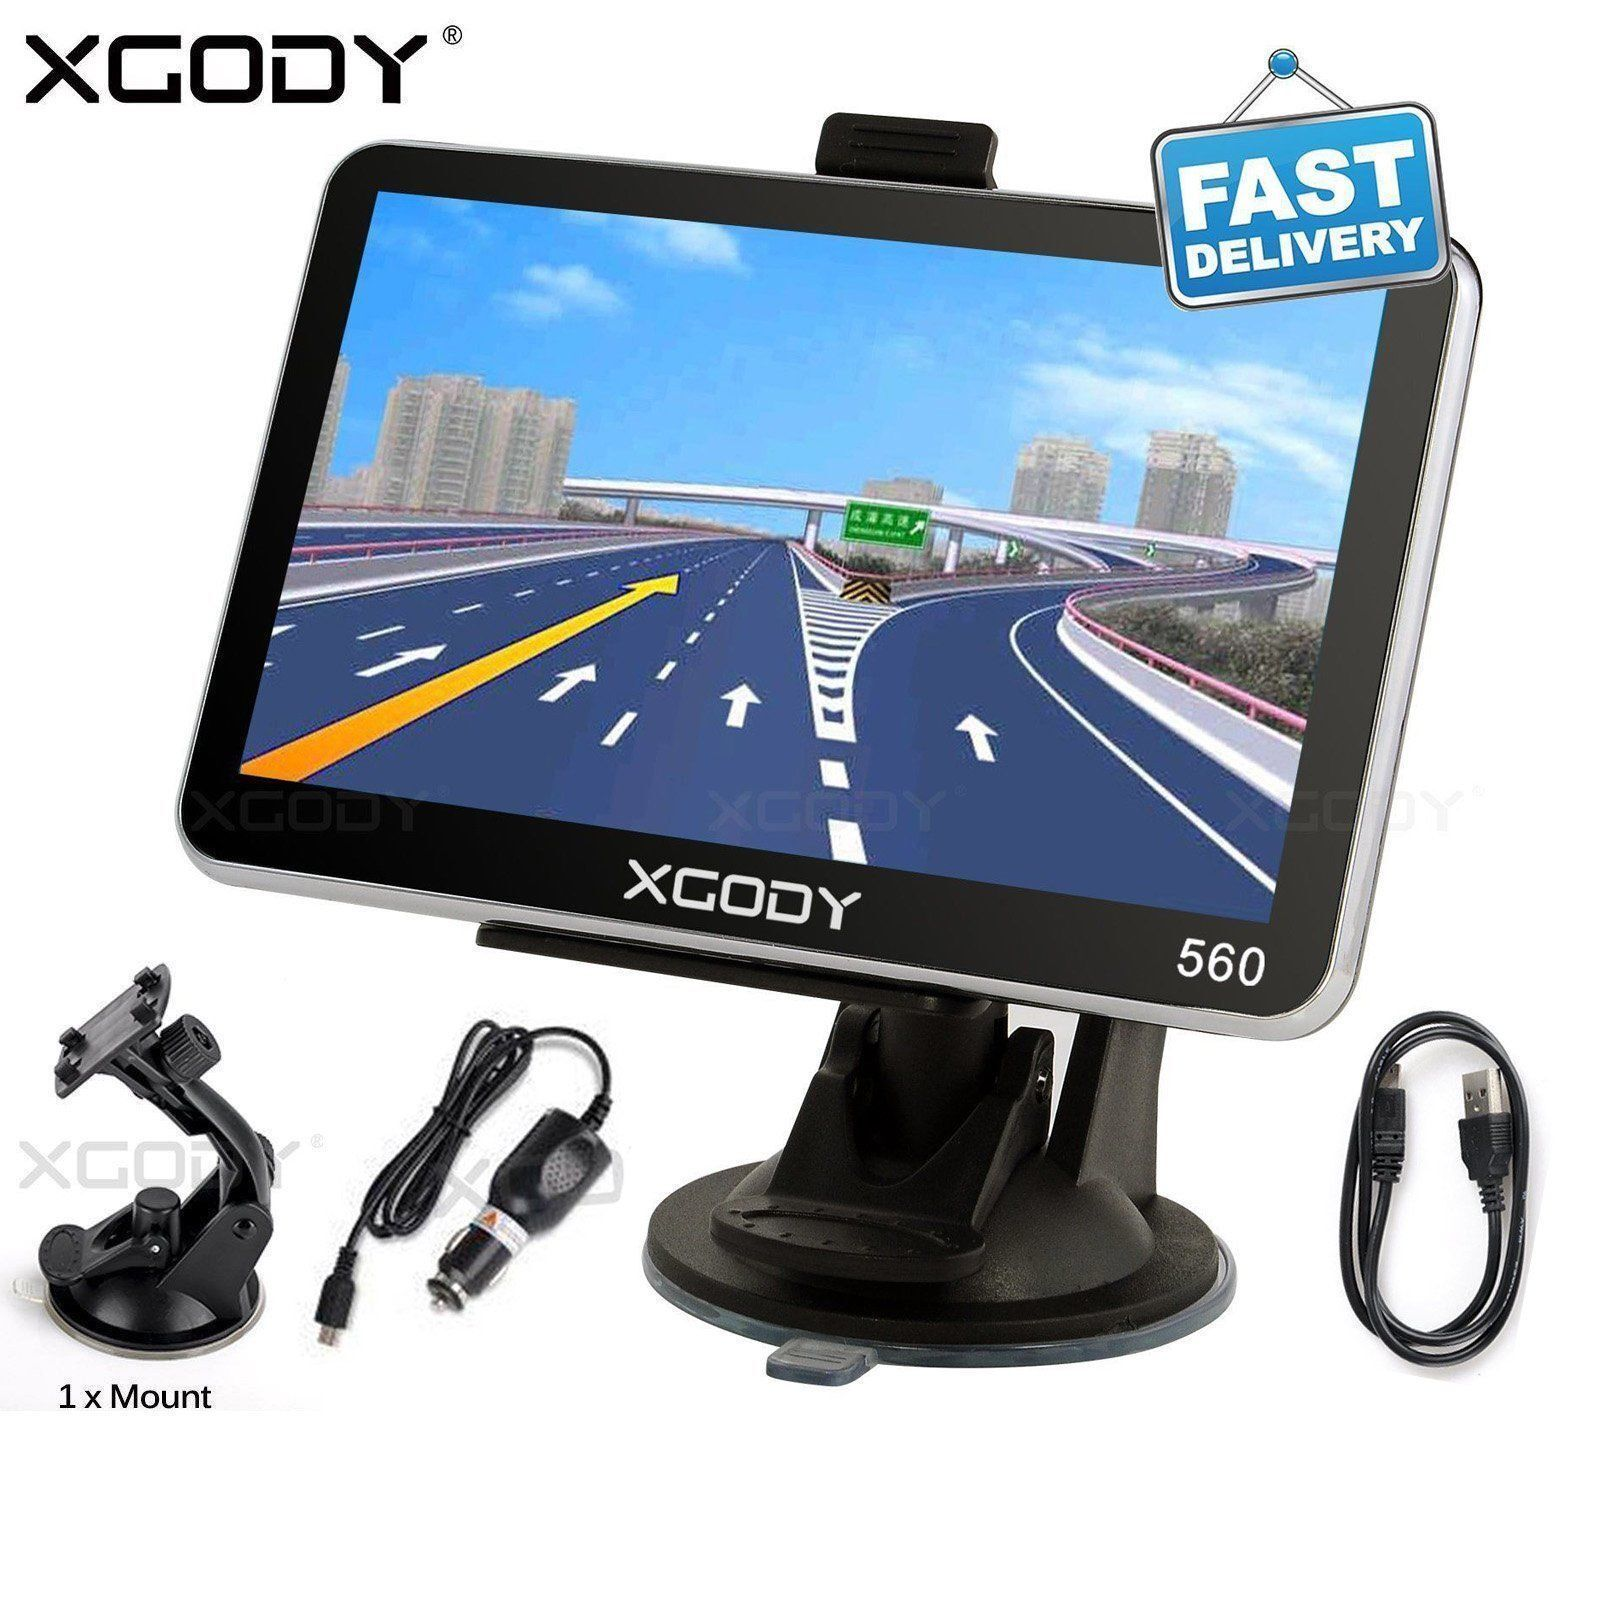 XGODY 5'' TRUCK CAR Navigation GPS Navigator SAT NAV 8GB All US Map SPEEDCAM POI